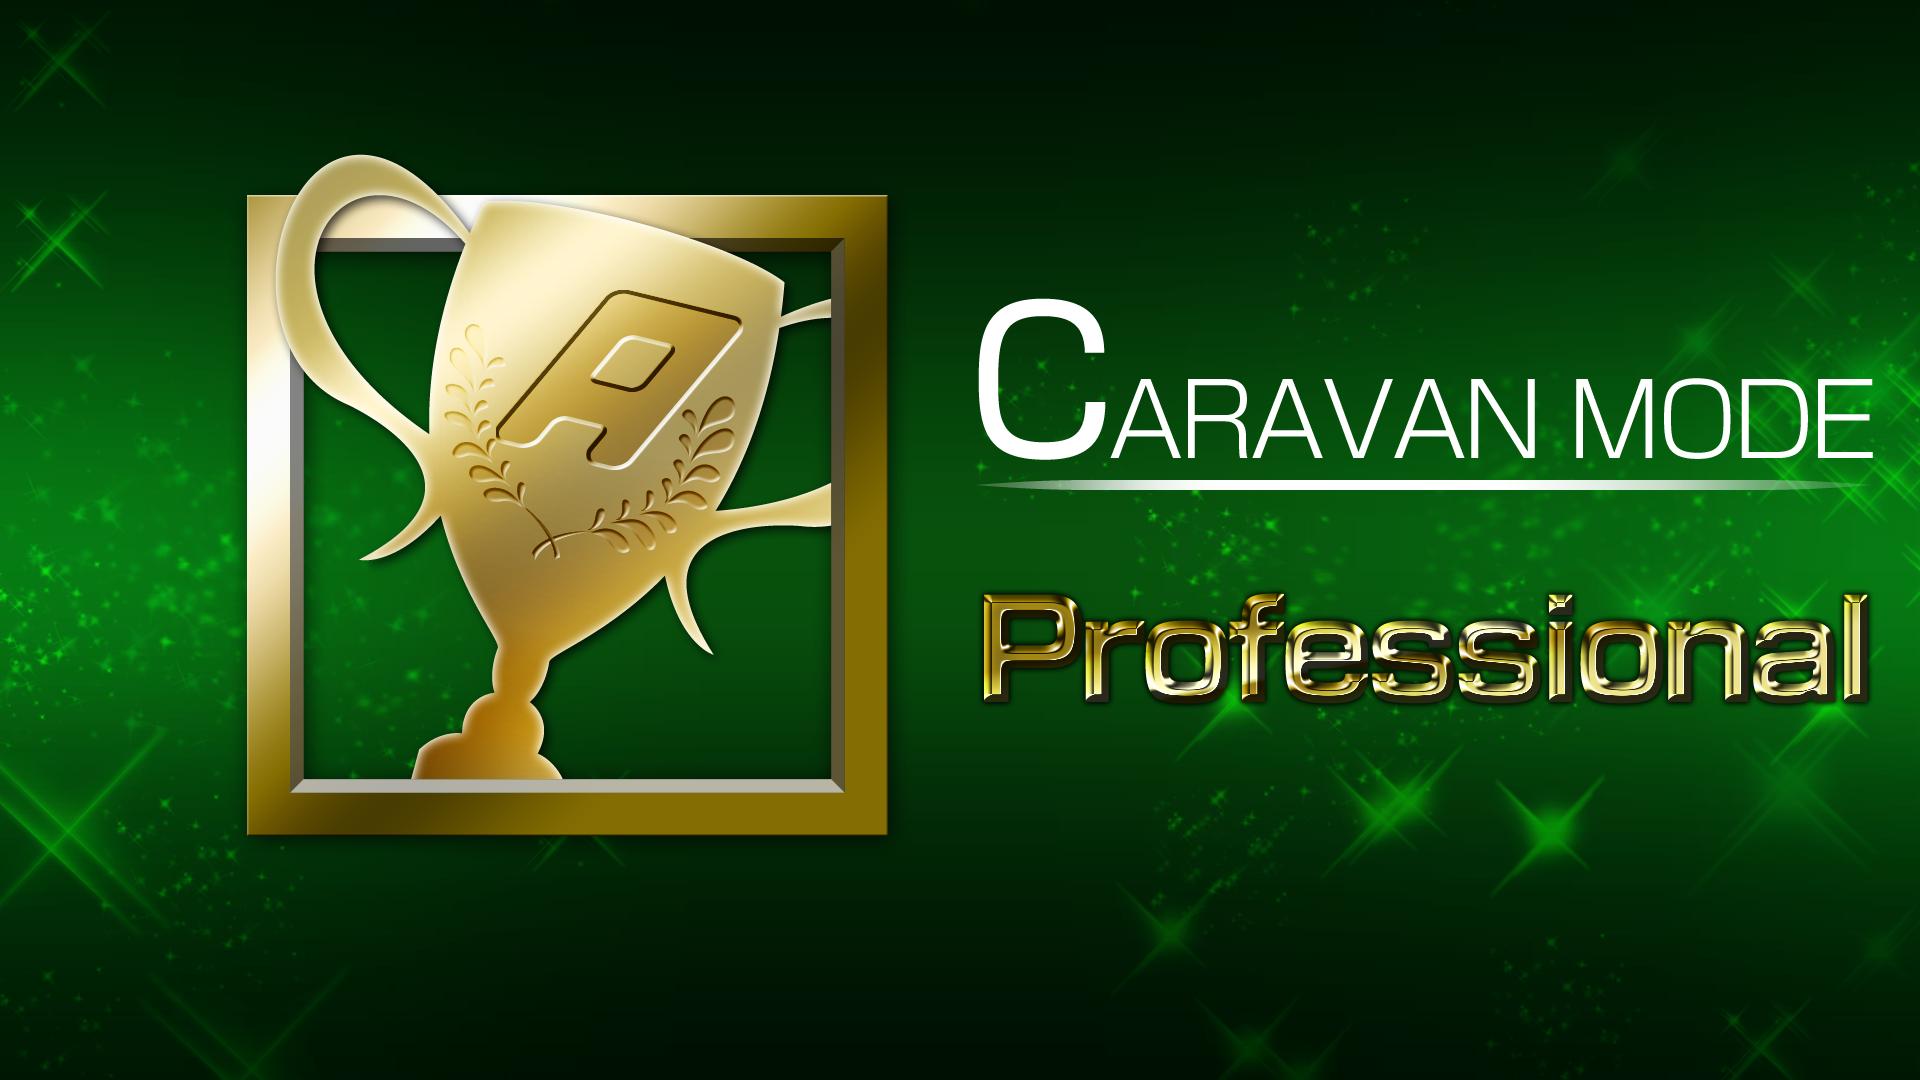 Icon for CARAVAN MODE 2,000 points